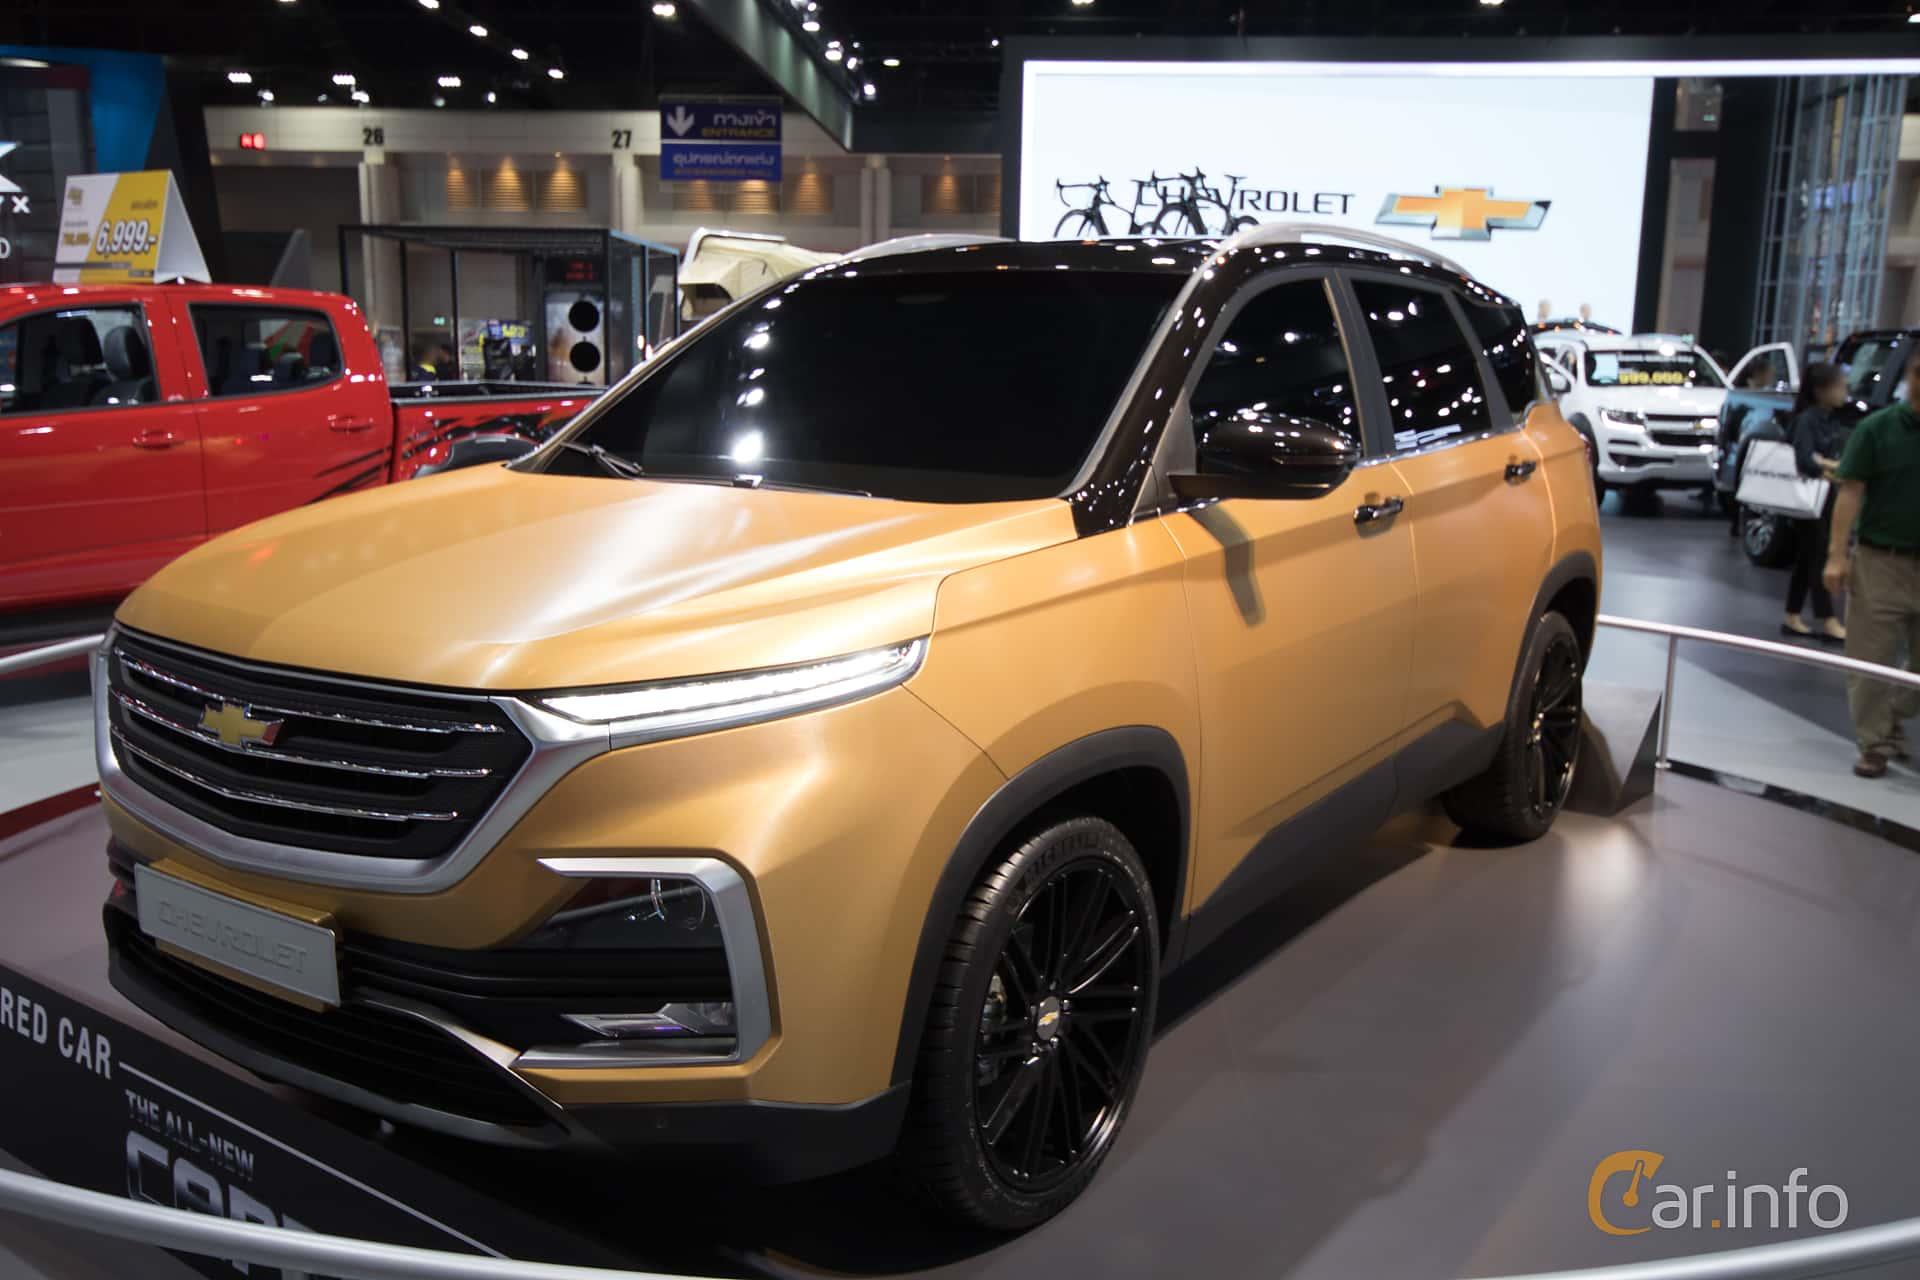 Chevrolet Captiva 1.5 150hp, 2019 at Bangkok Motor Show 2019